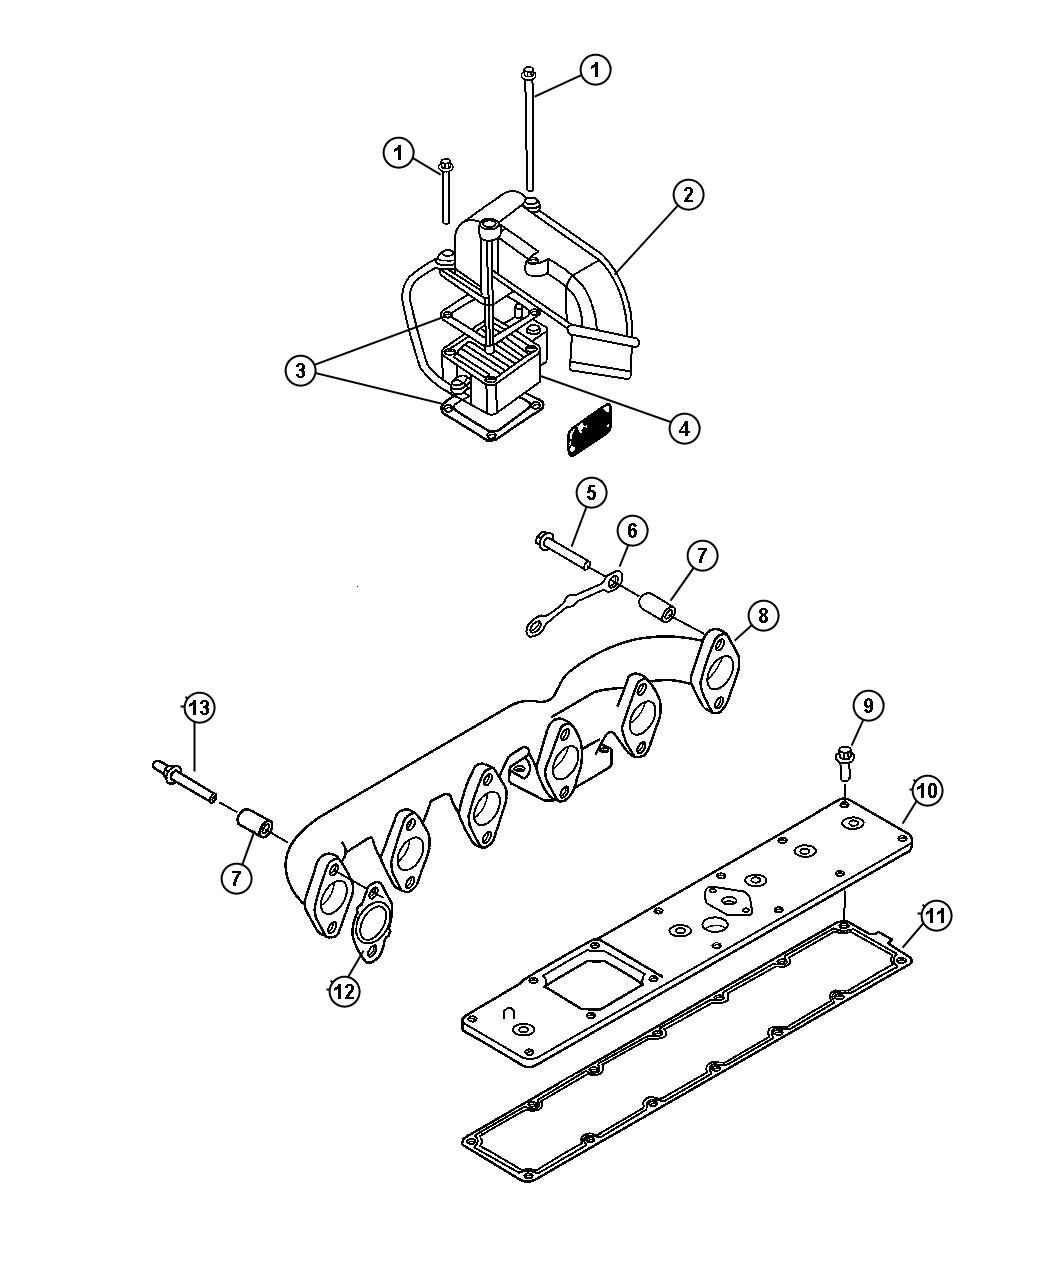 Dodge Ram Heater Air Intake Engine Federal